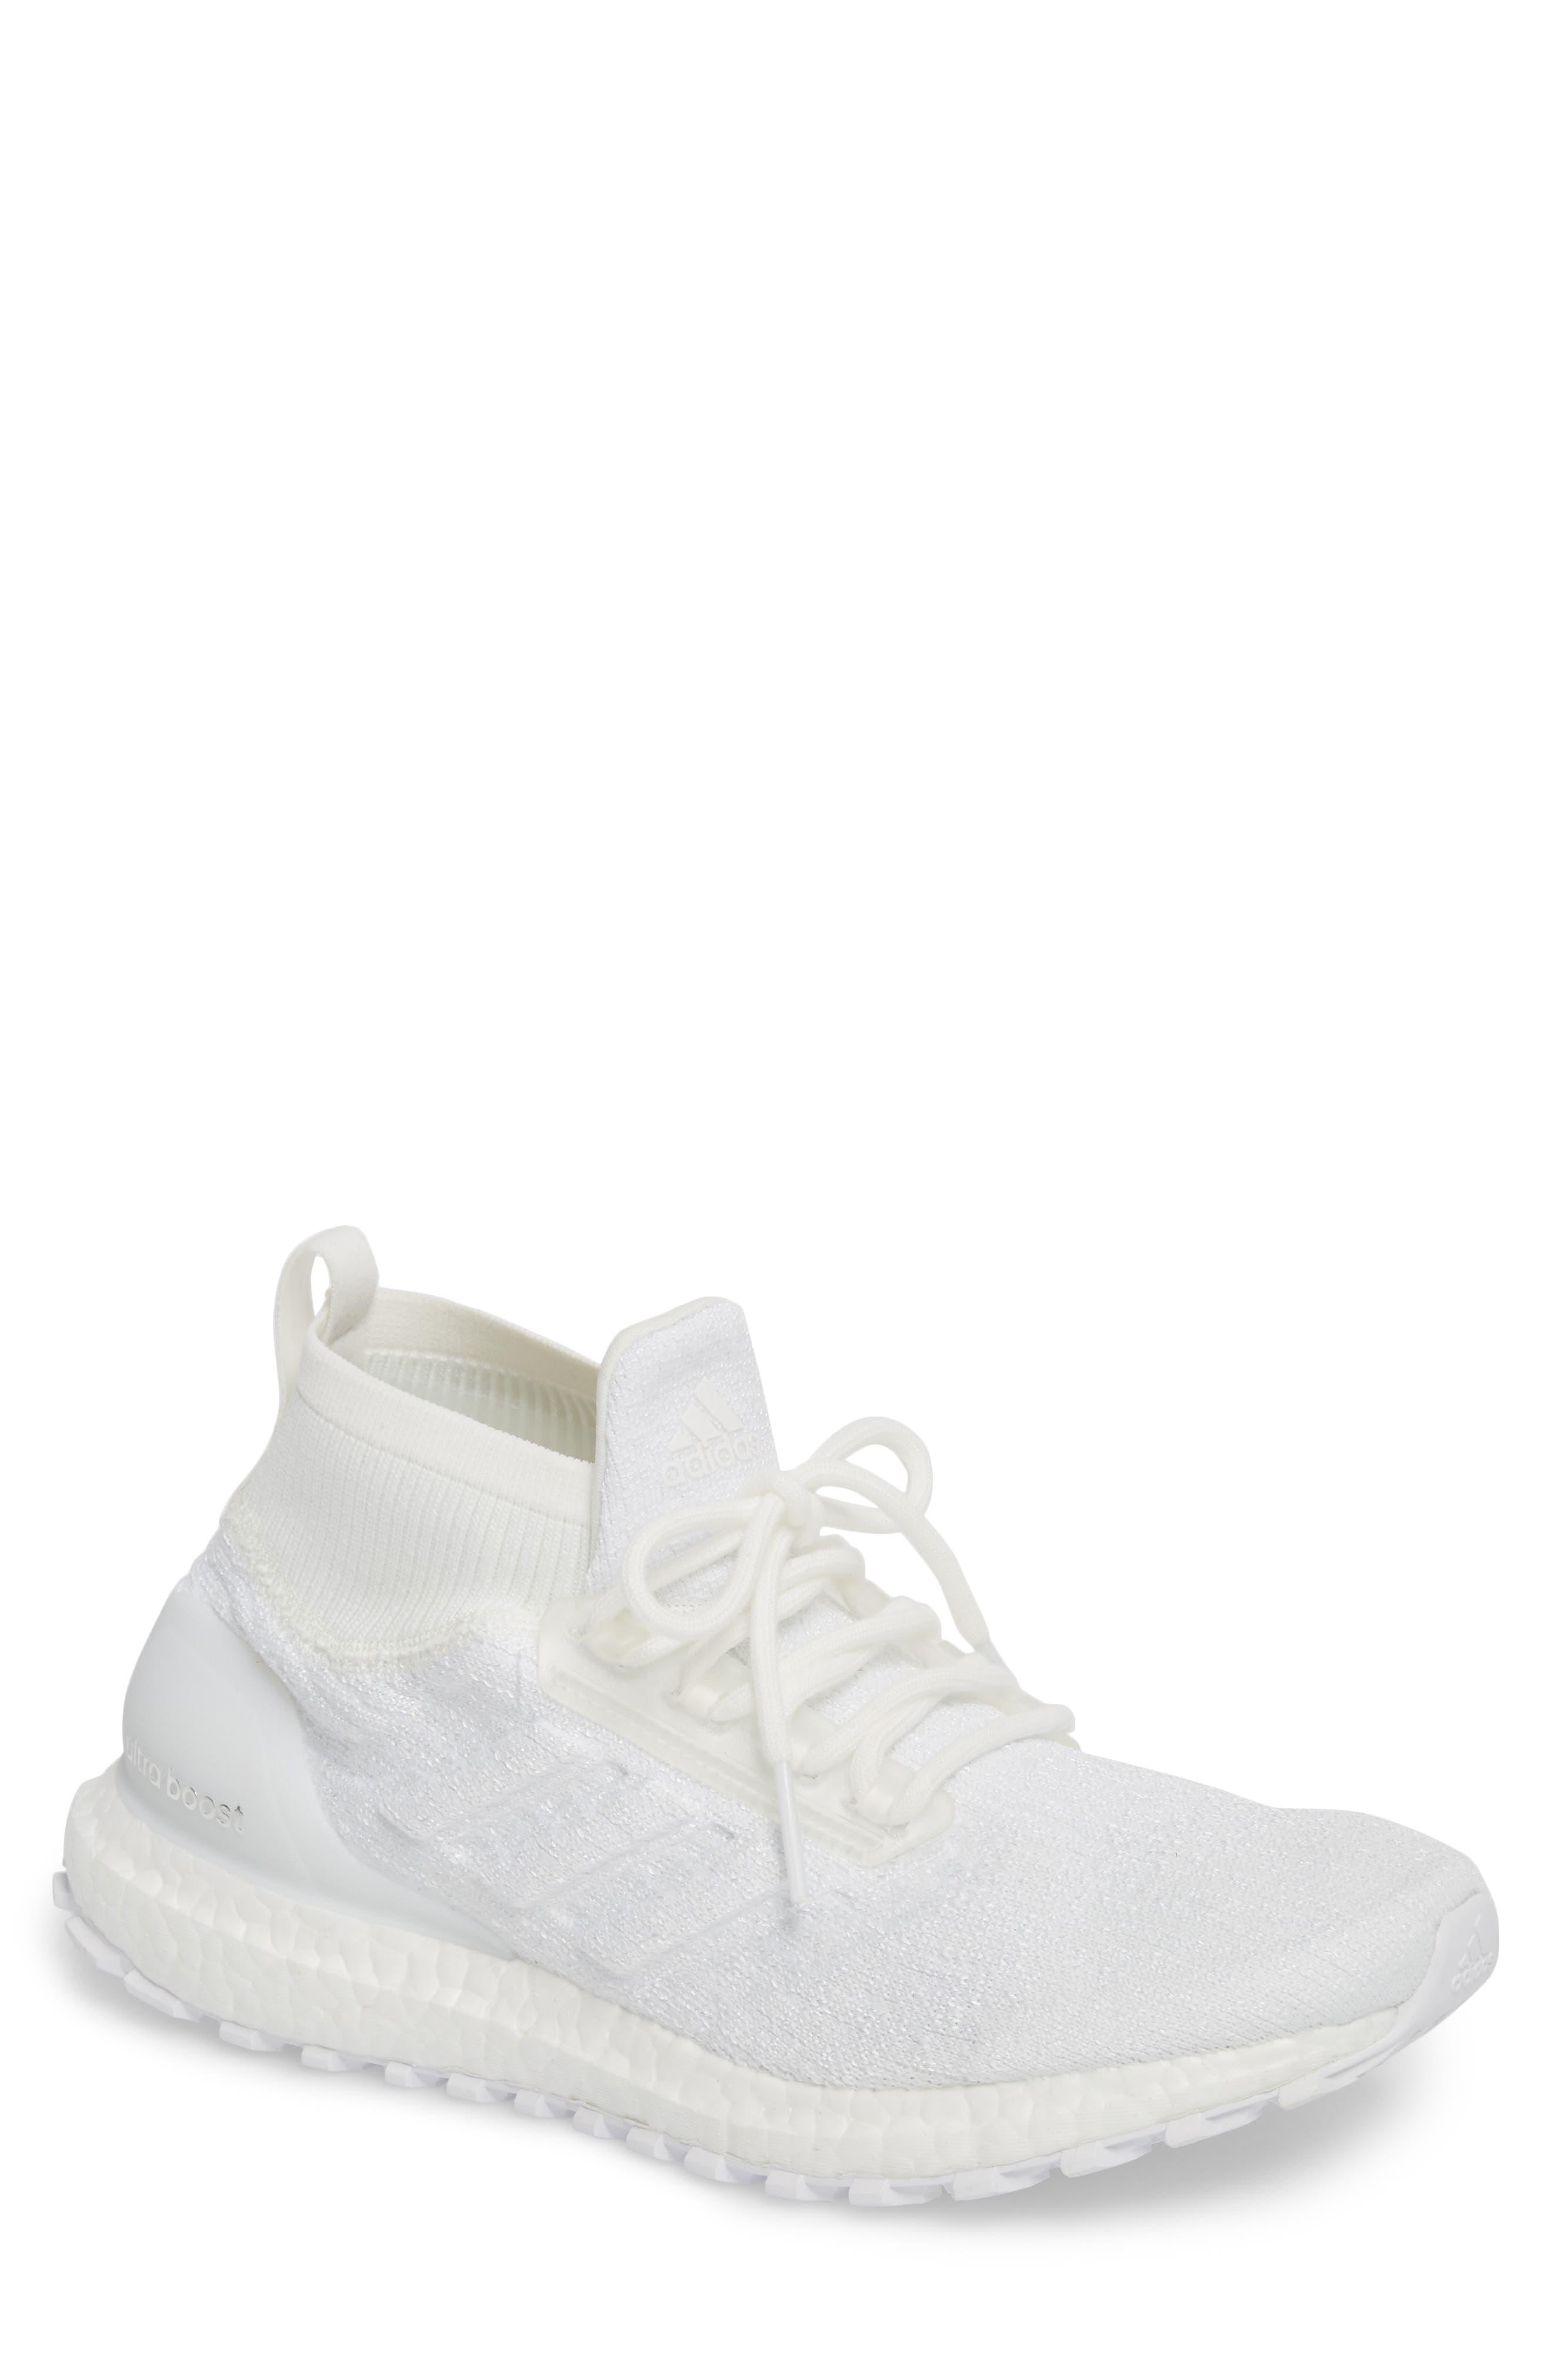 adidas UltraBoost All Terrain Water Resistant Running Shoe (Men)